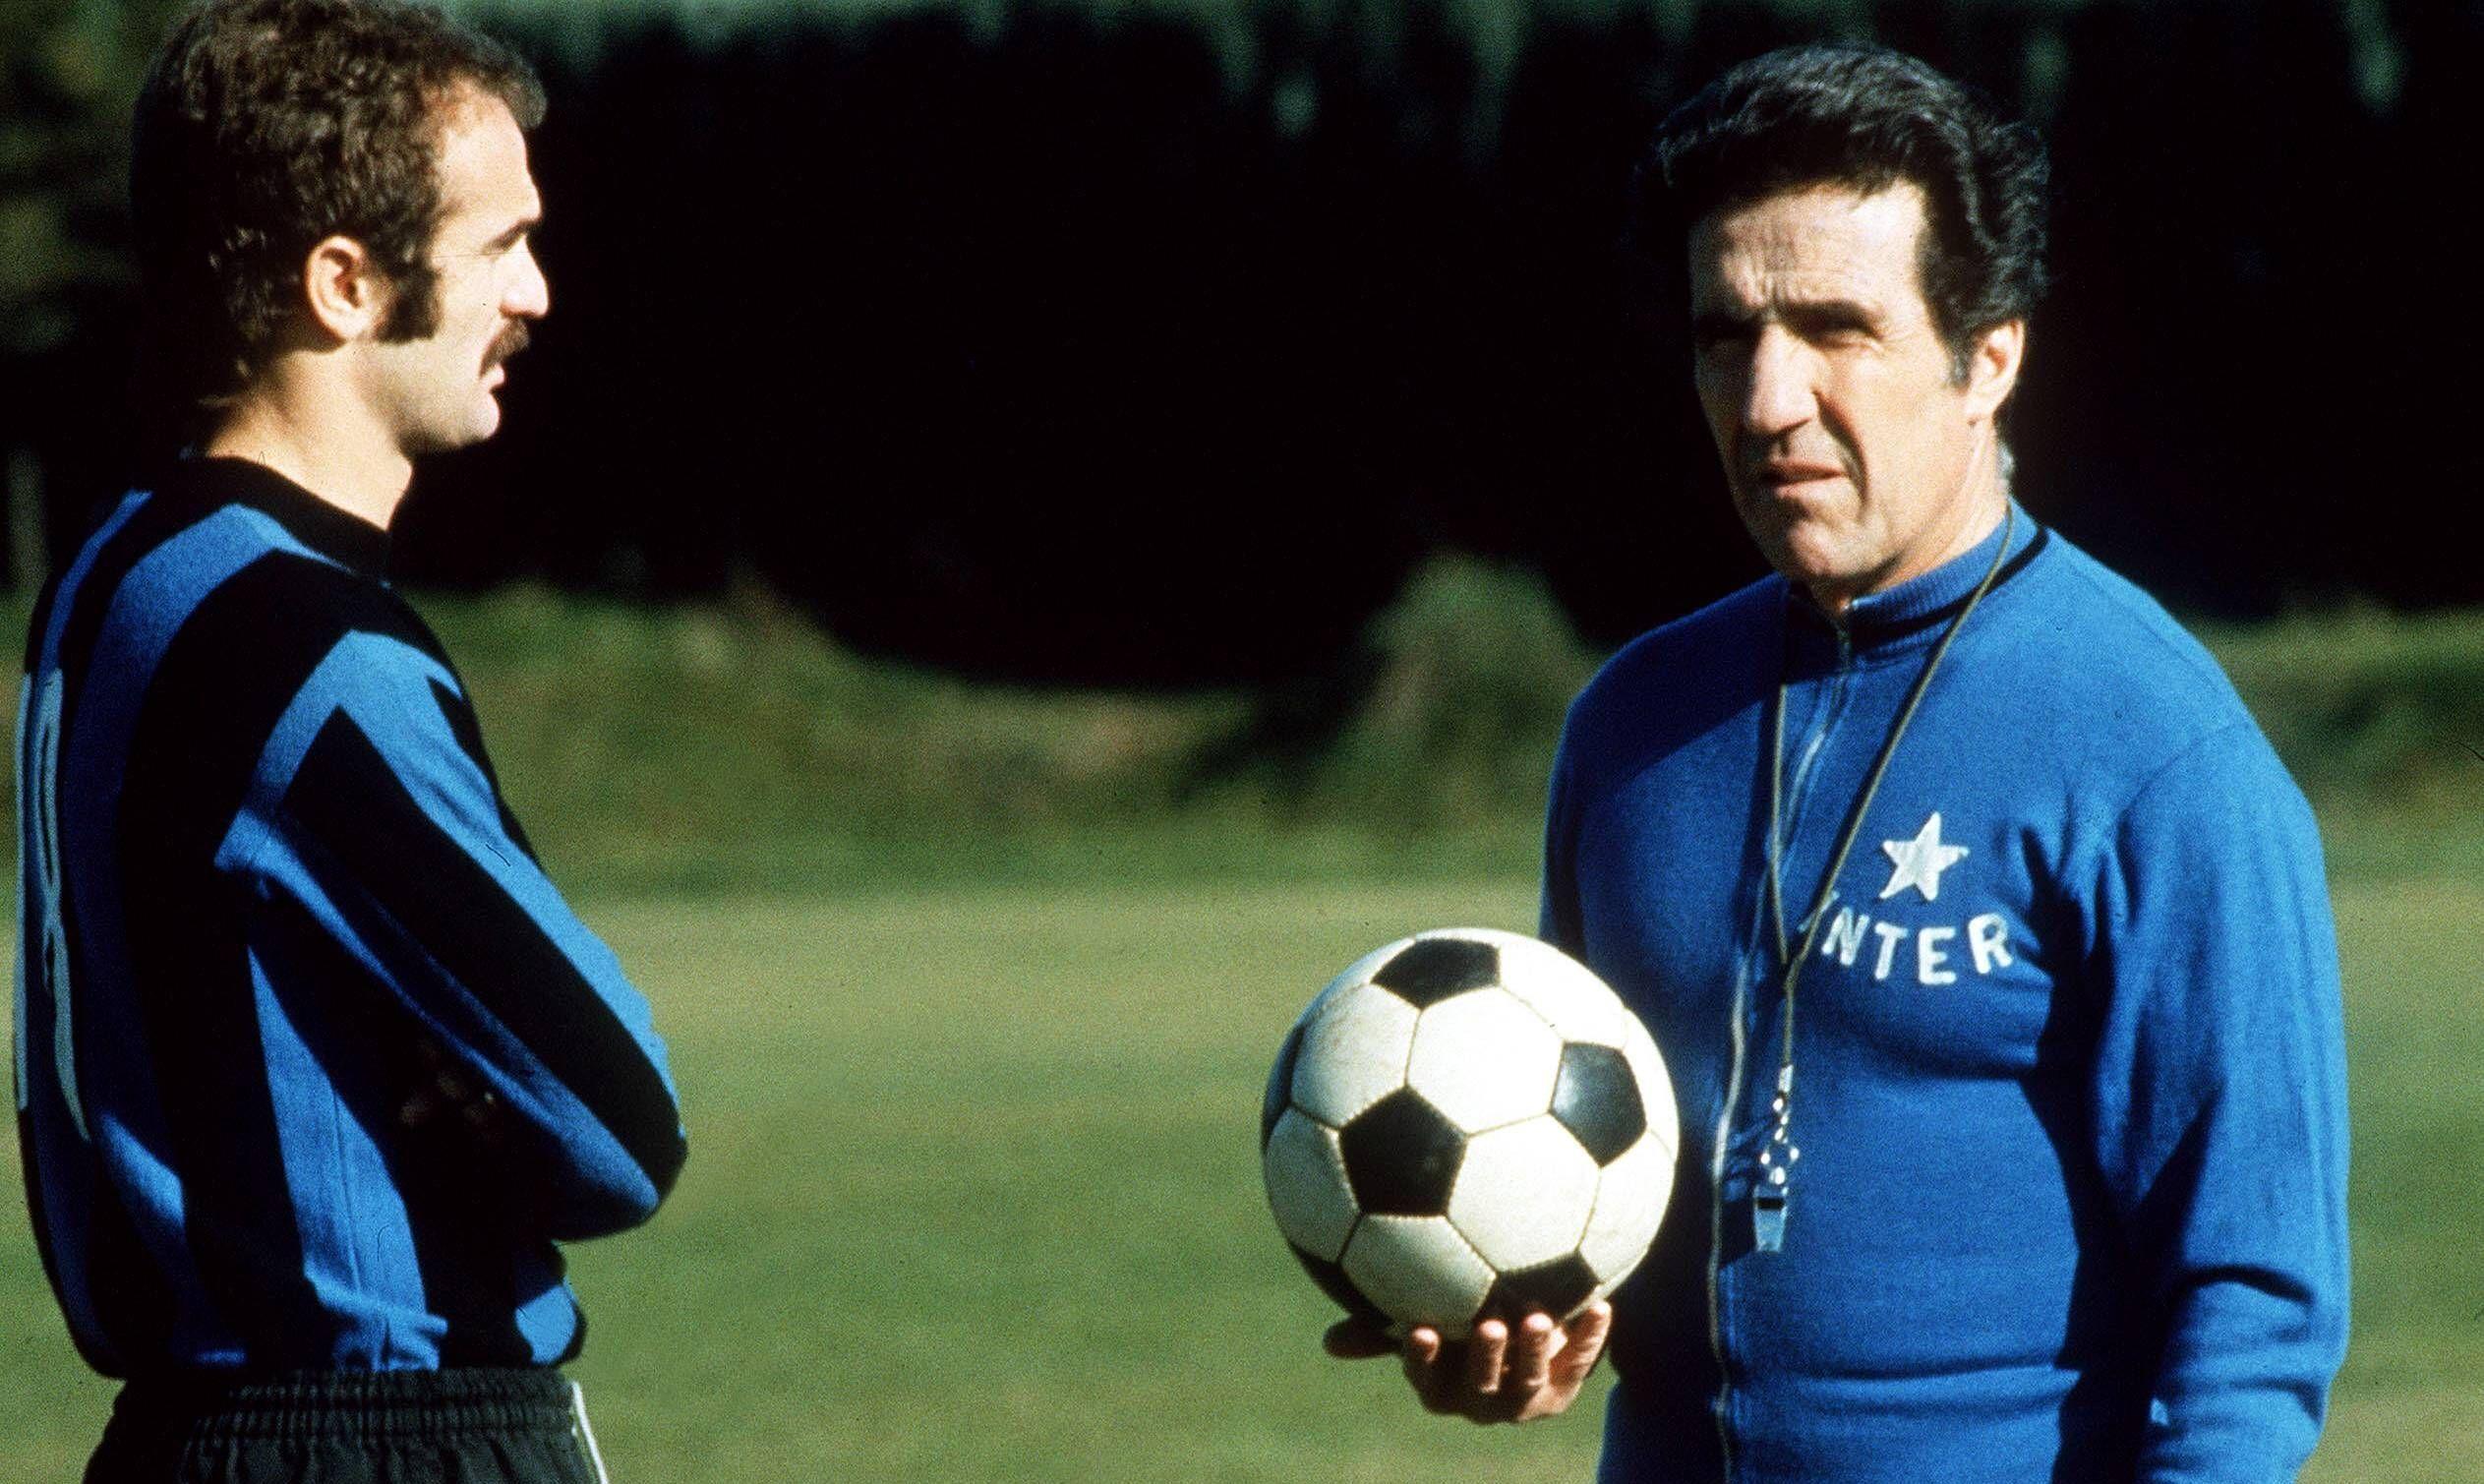 https://upload.wikimedia.org/wikipedia/commons/9/9e/1973%E2%80%9374_Inter_Milan_-_Sandro_Mazzola_and_Helenio_Herrera.jpg